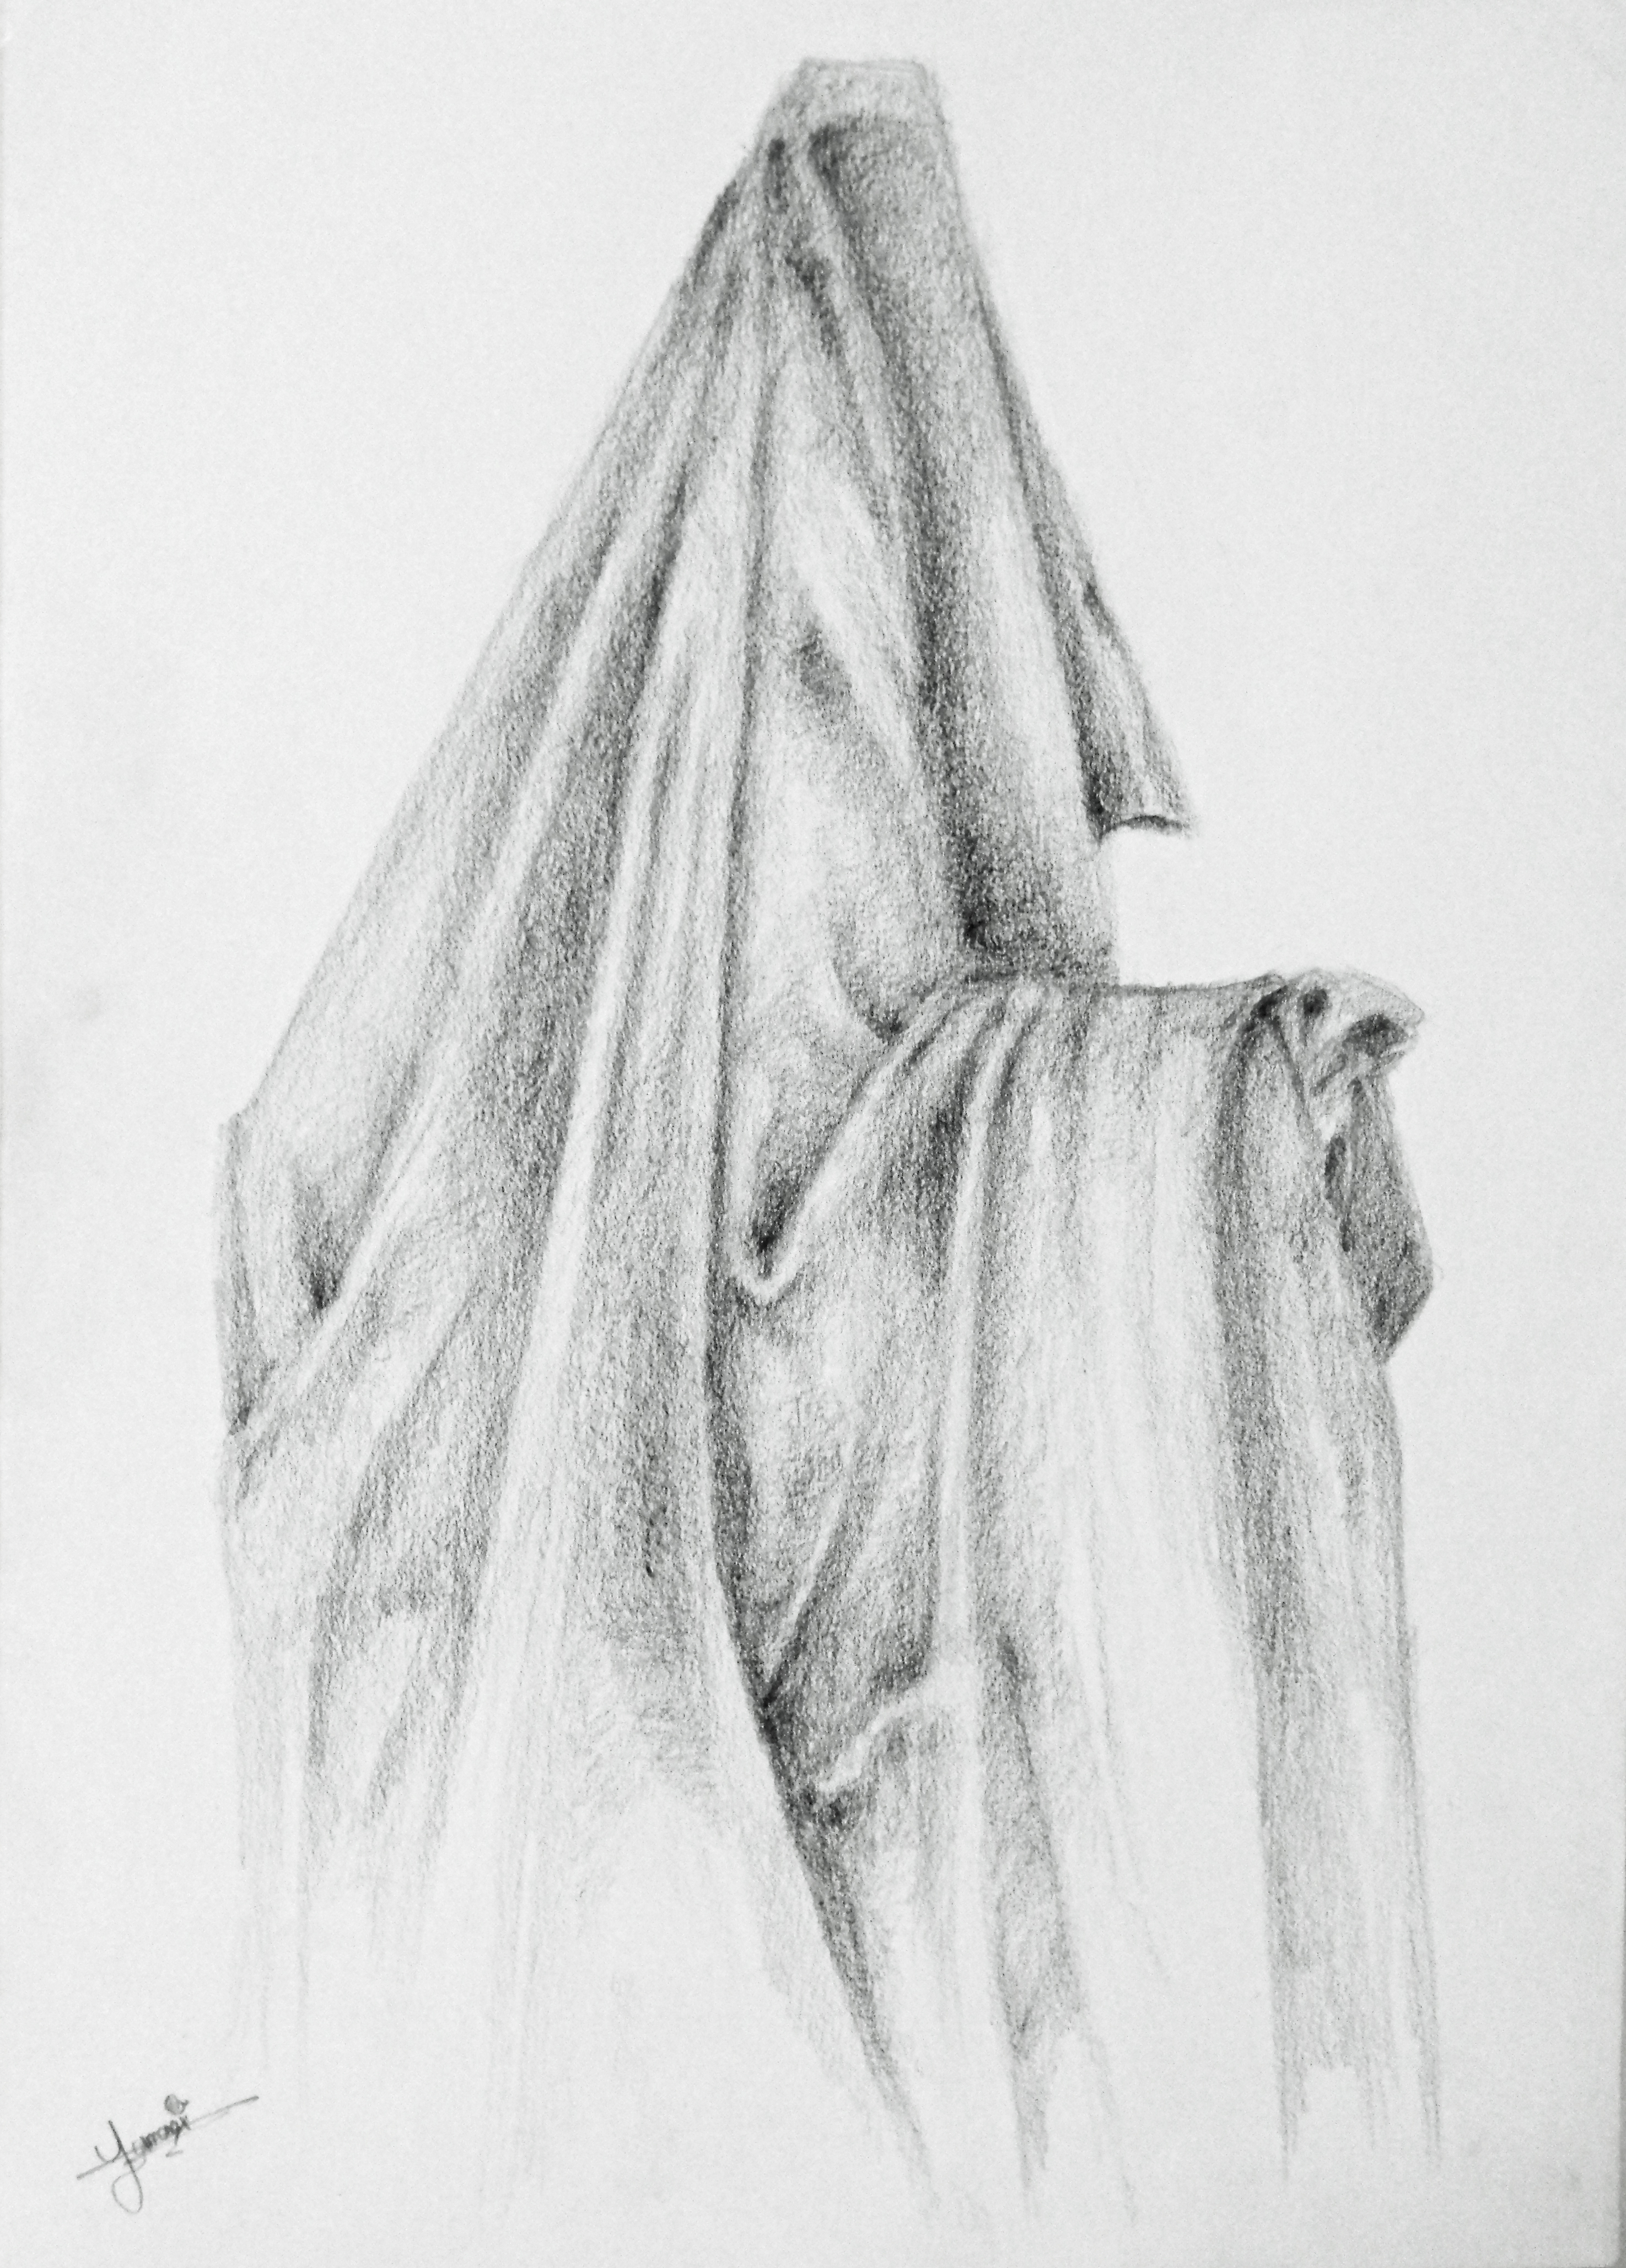 Drawn pyramid pencil 2B Pencil of B Egypt